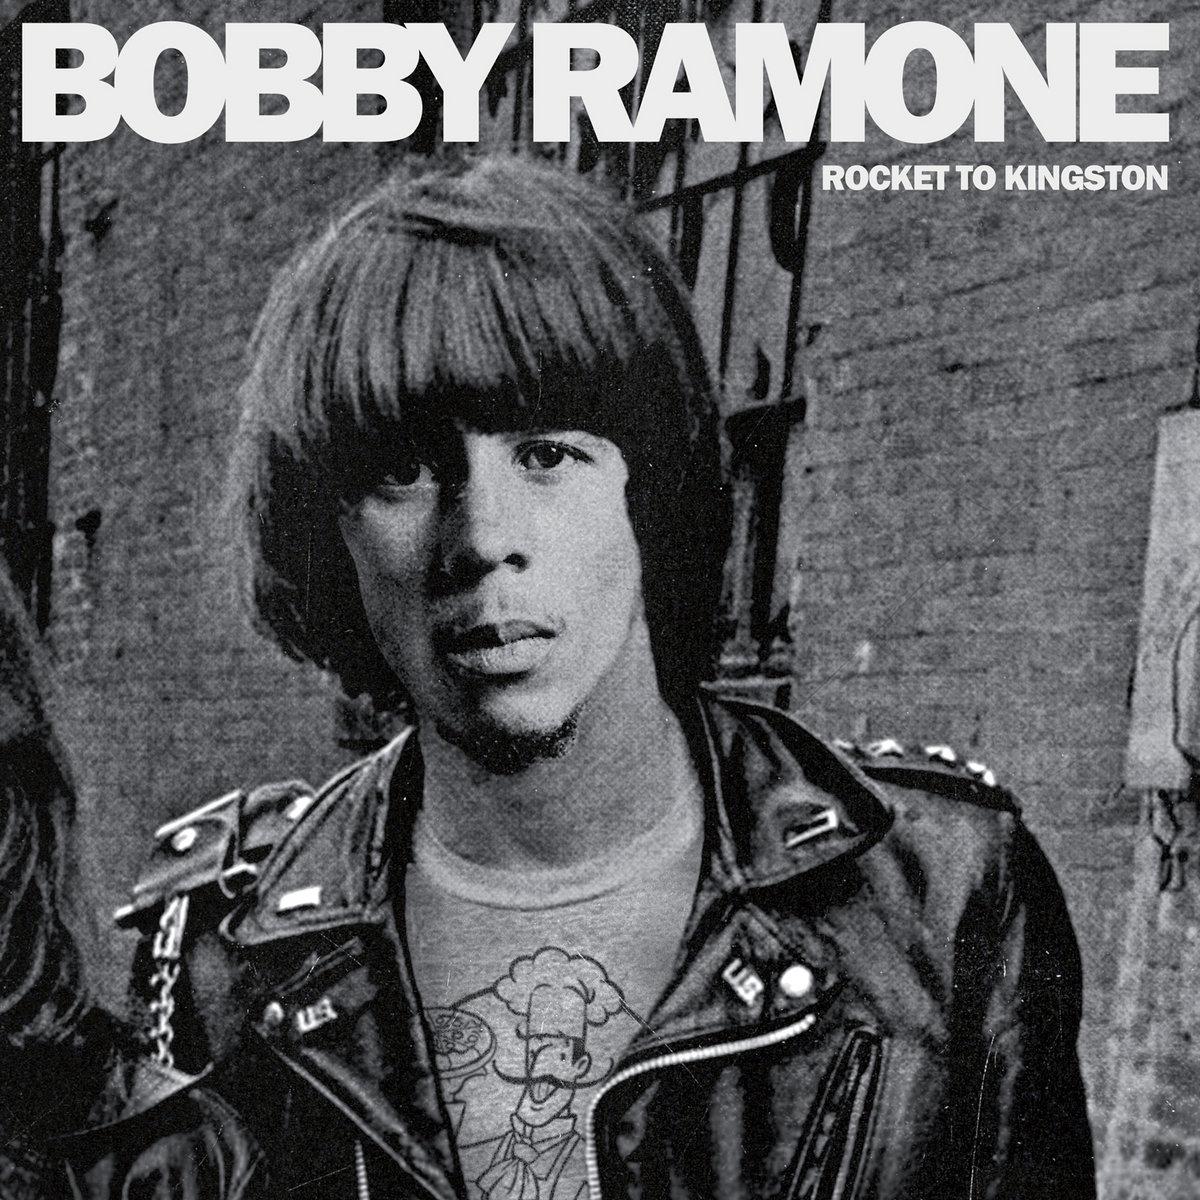 Bobby Ramone – Rocket To Kingston (Guerilla Asso)